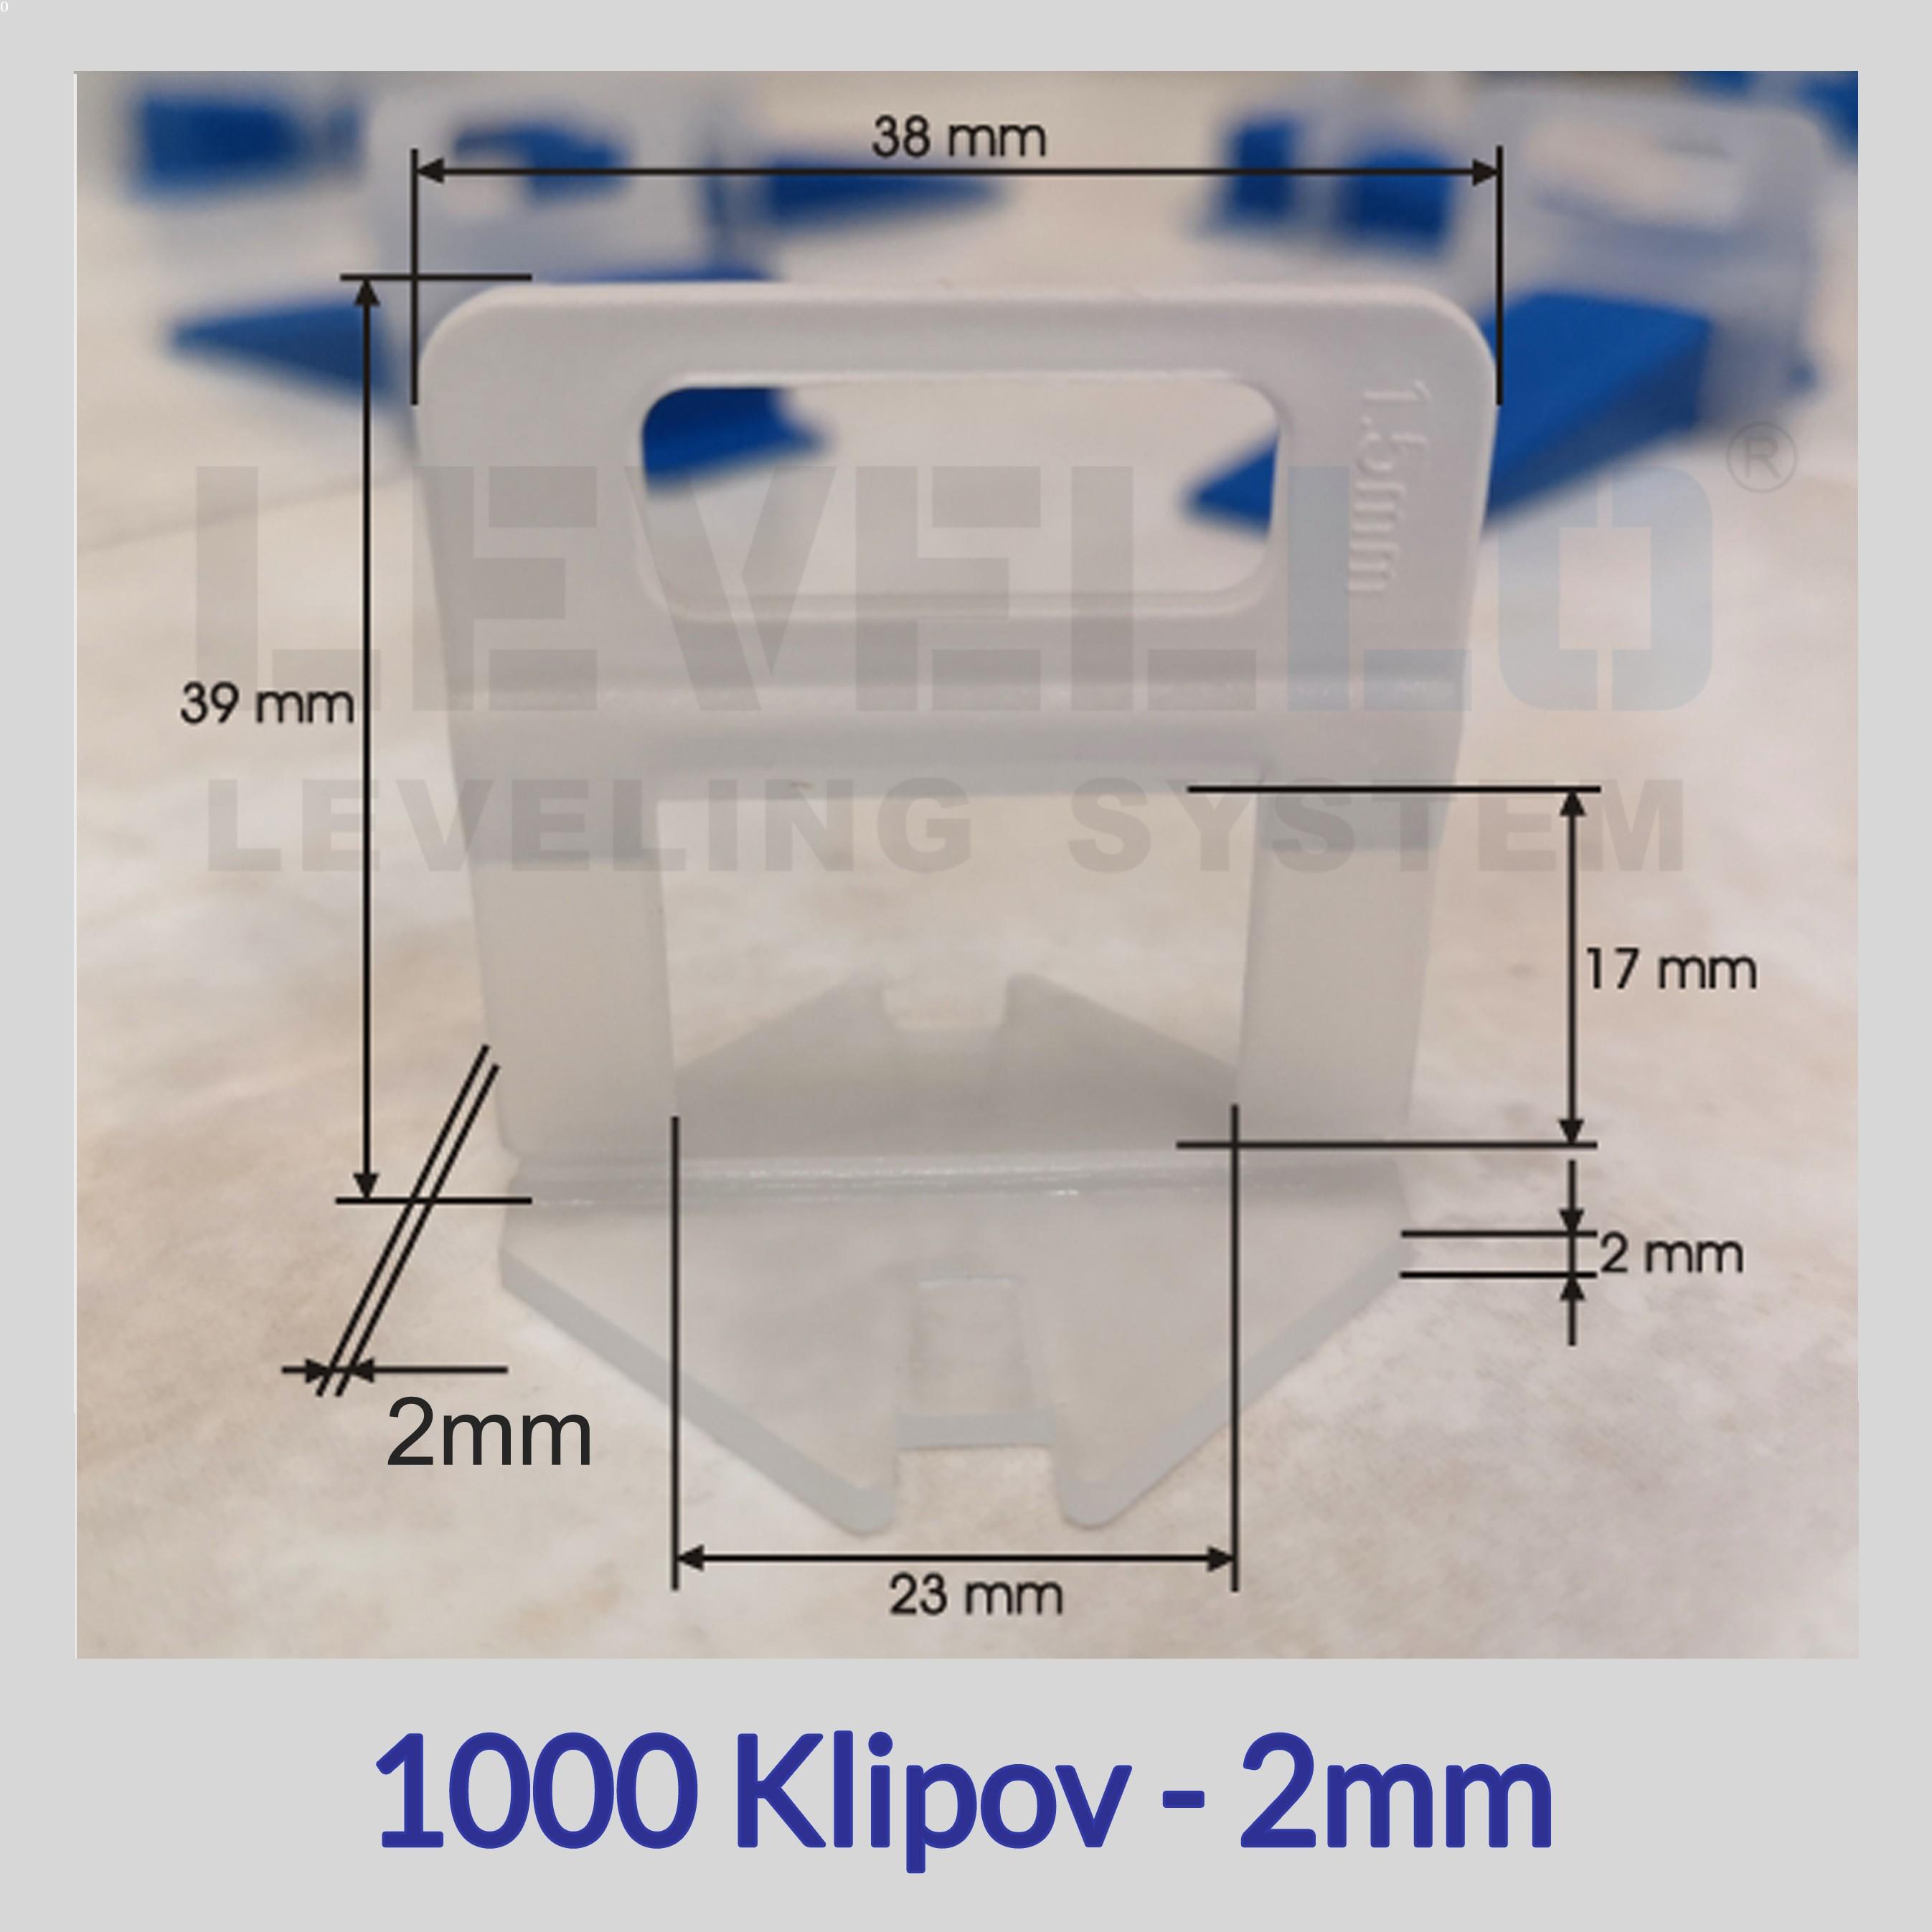 Klipy Eko LEVELLO ® 2 mm, 1000 kusov